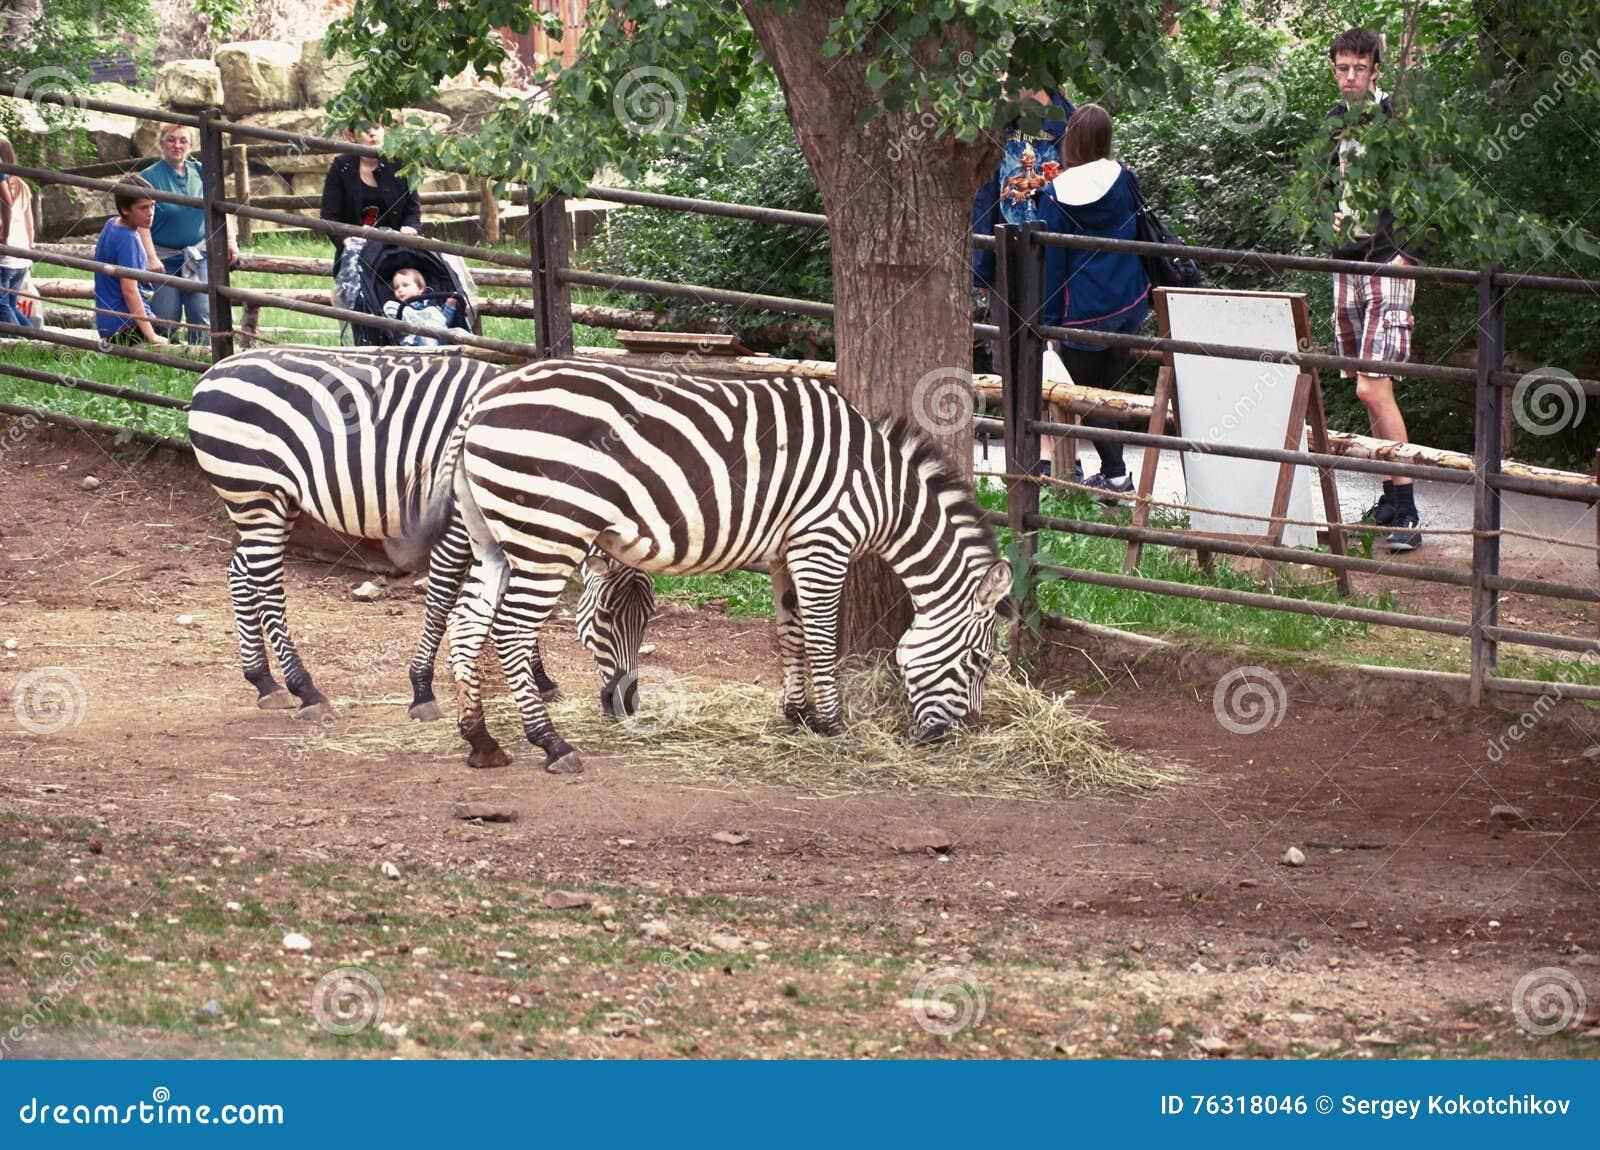 Cesky τσεχική πόλης όψη δημοκρατιών krumlov μεσαιωνική παλαιά Πράγα Ζωολογικός κήπος της Πράγας Zebras 12 Ιουνίου 2016